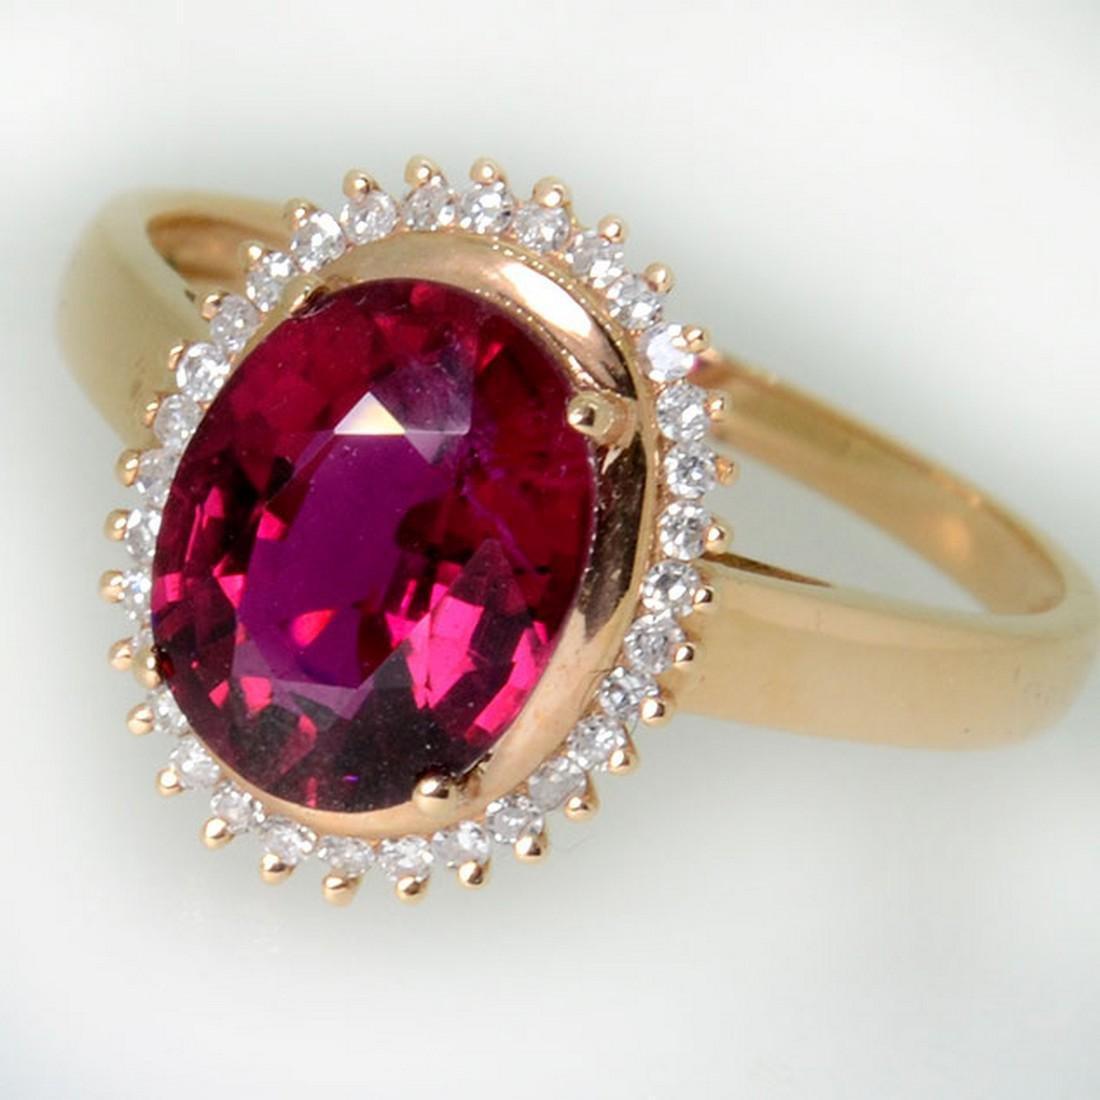 2.17 g Yellow Gold Rubylite Diamond Ring